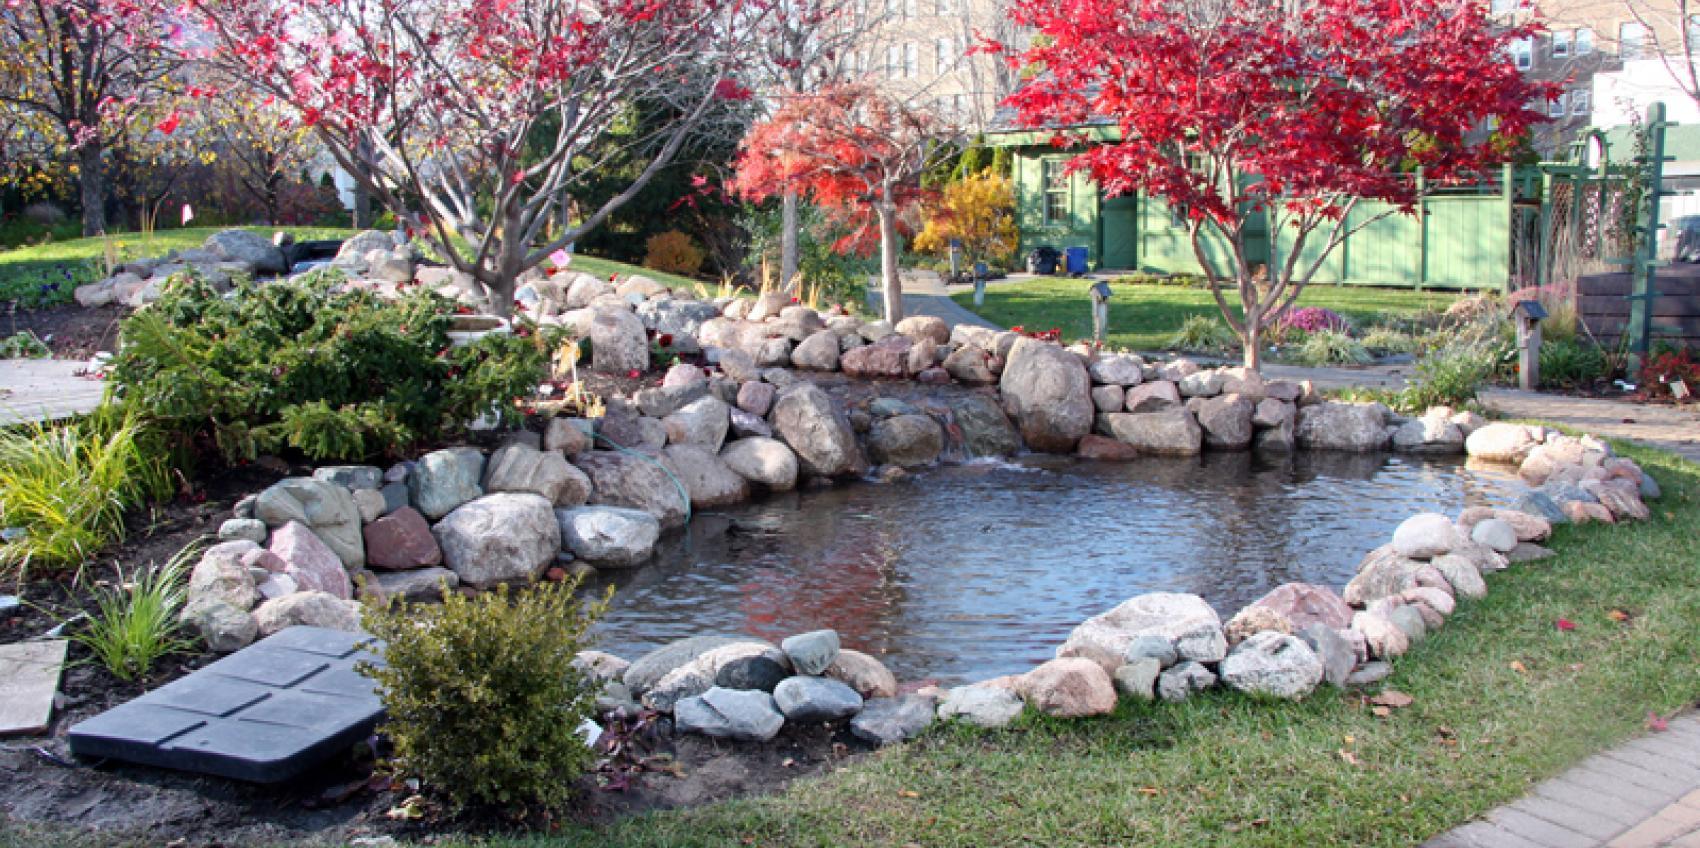 Homes & Gardens Test Garden American Public